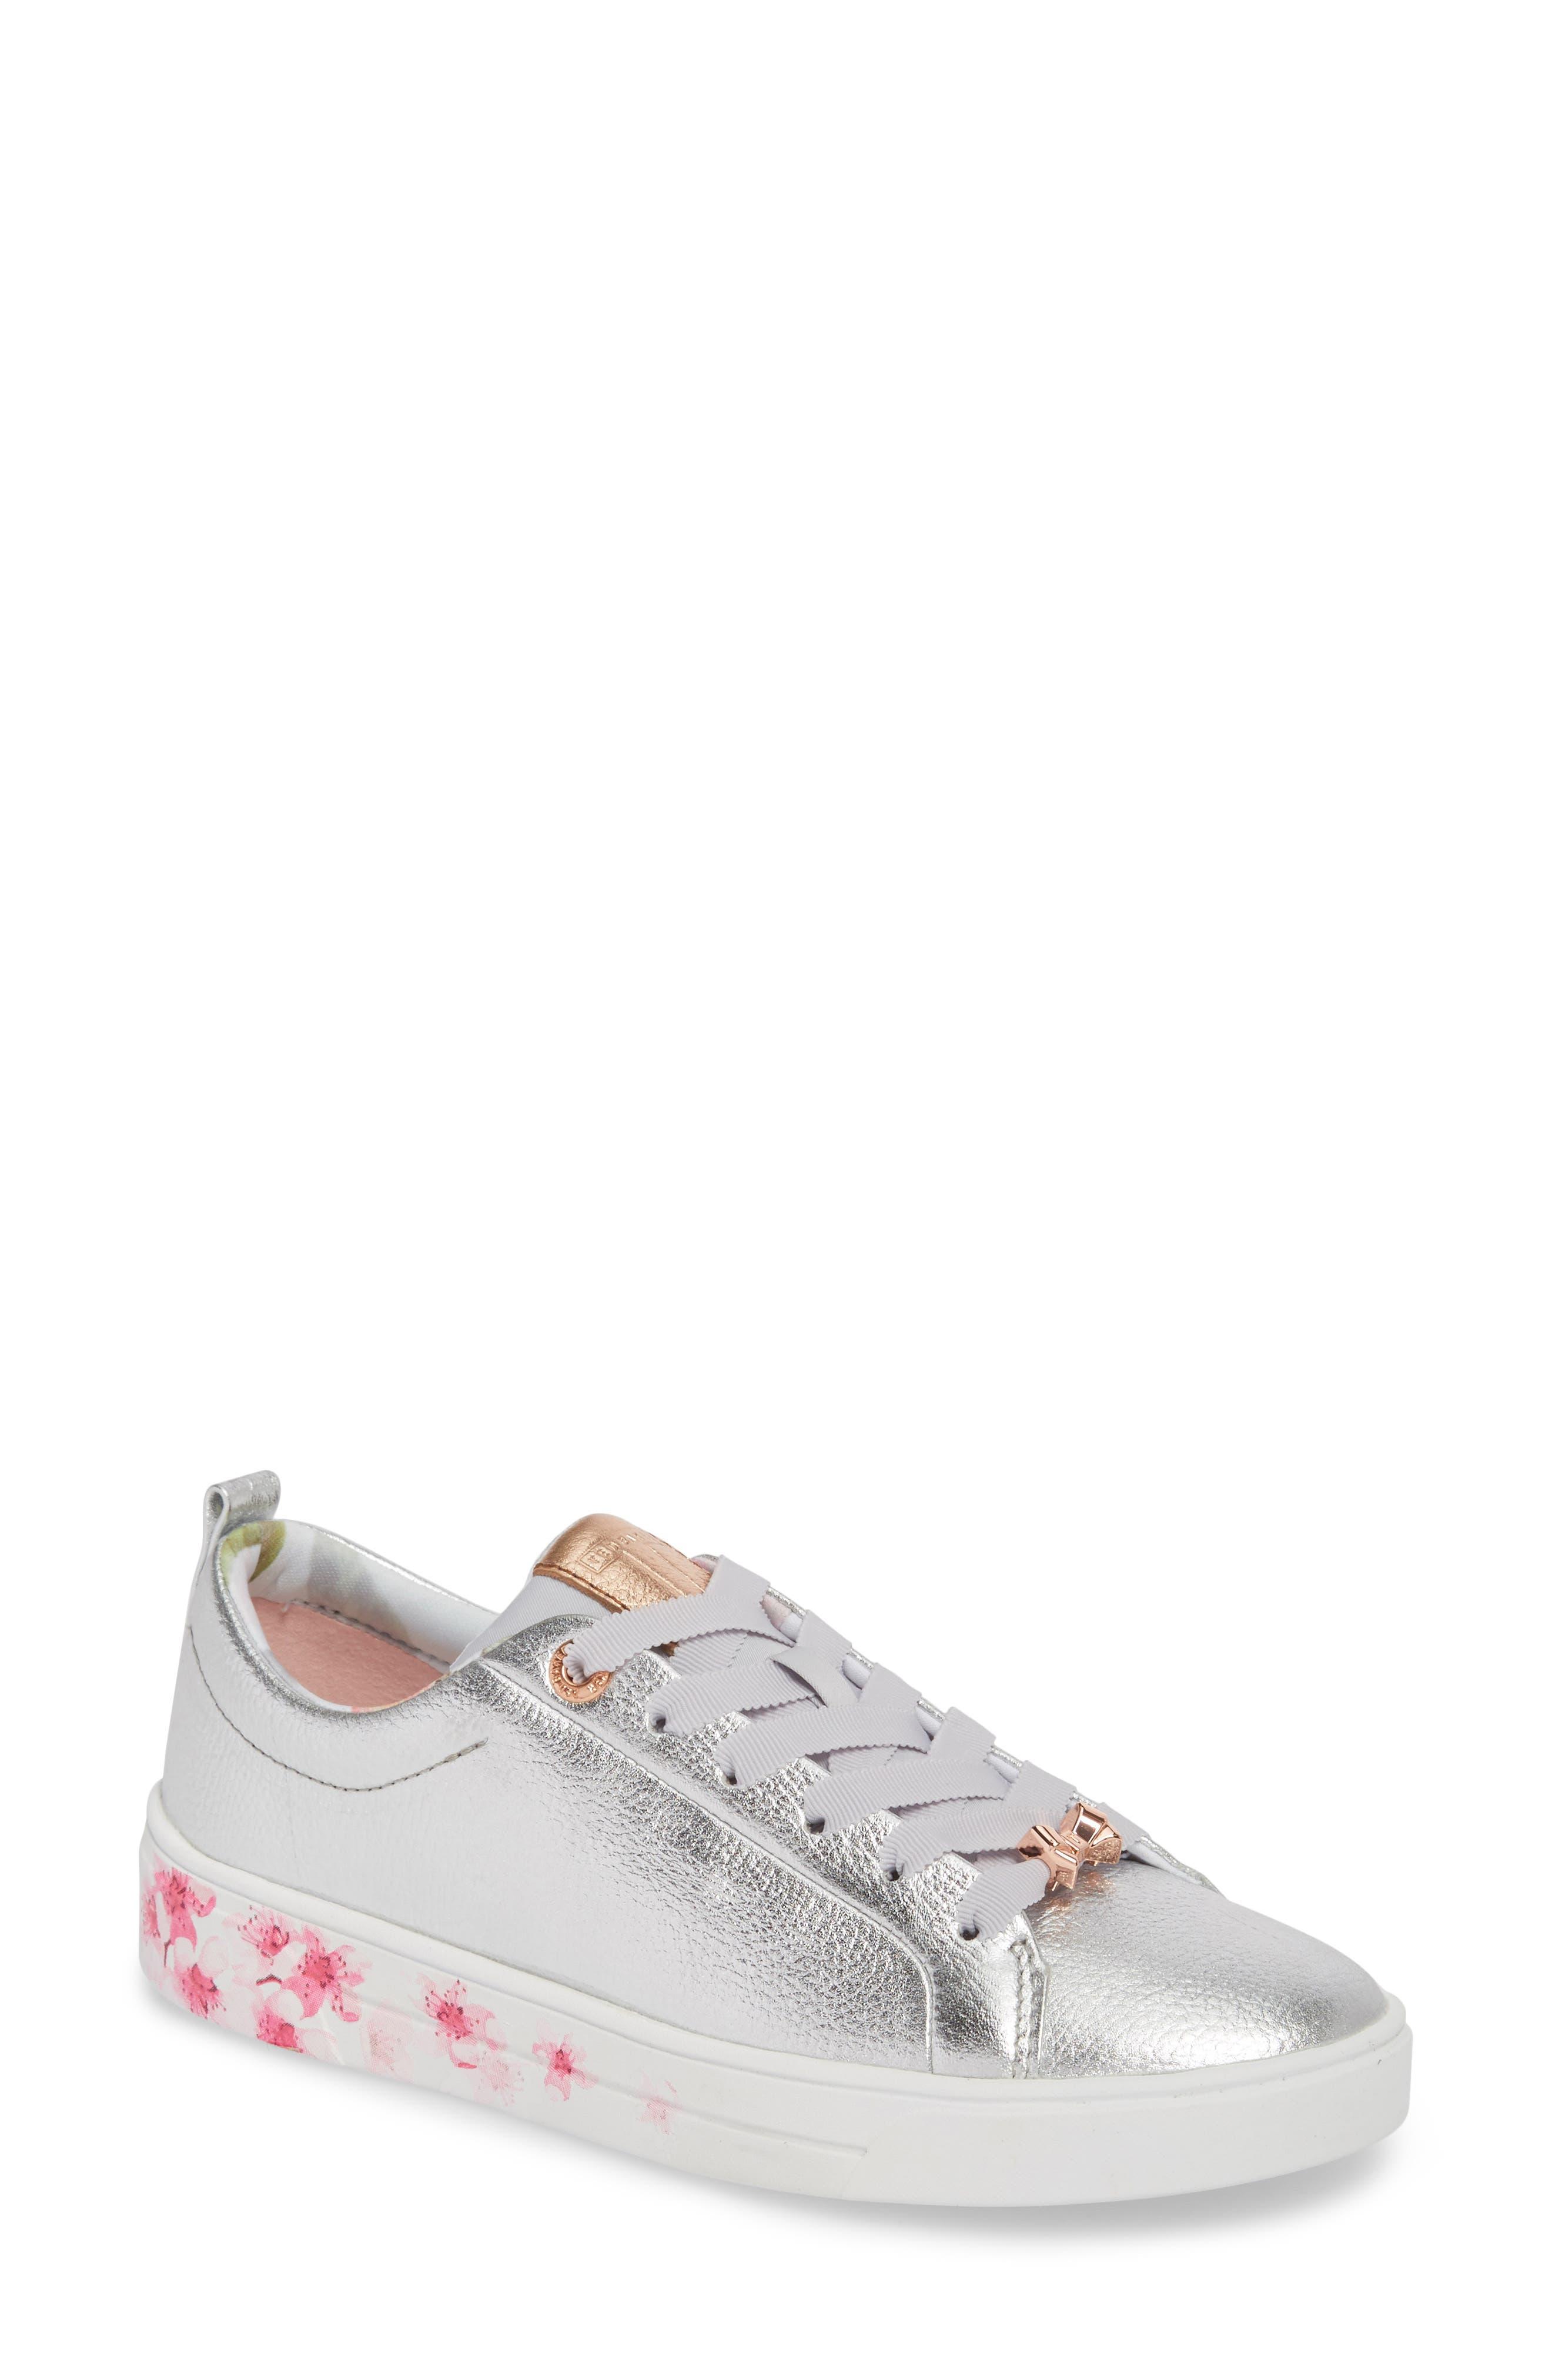 Kelleip Sneaker,                         Main,                         color, 047